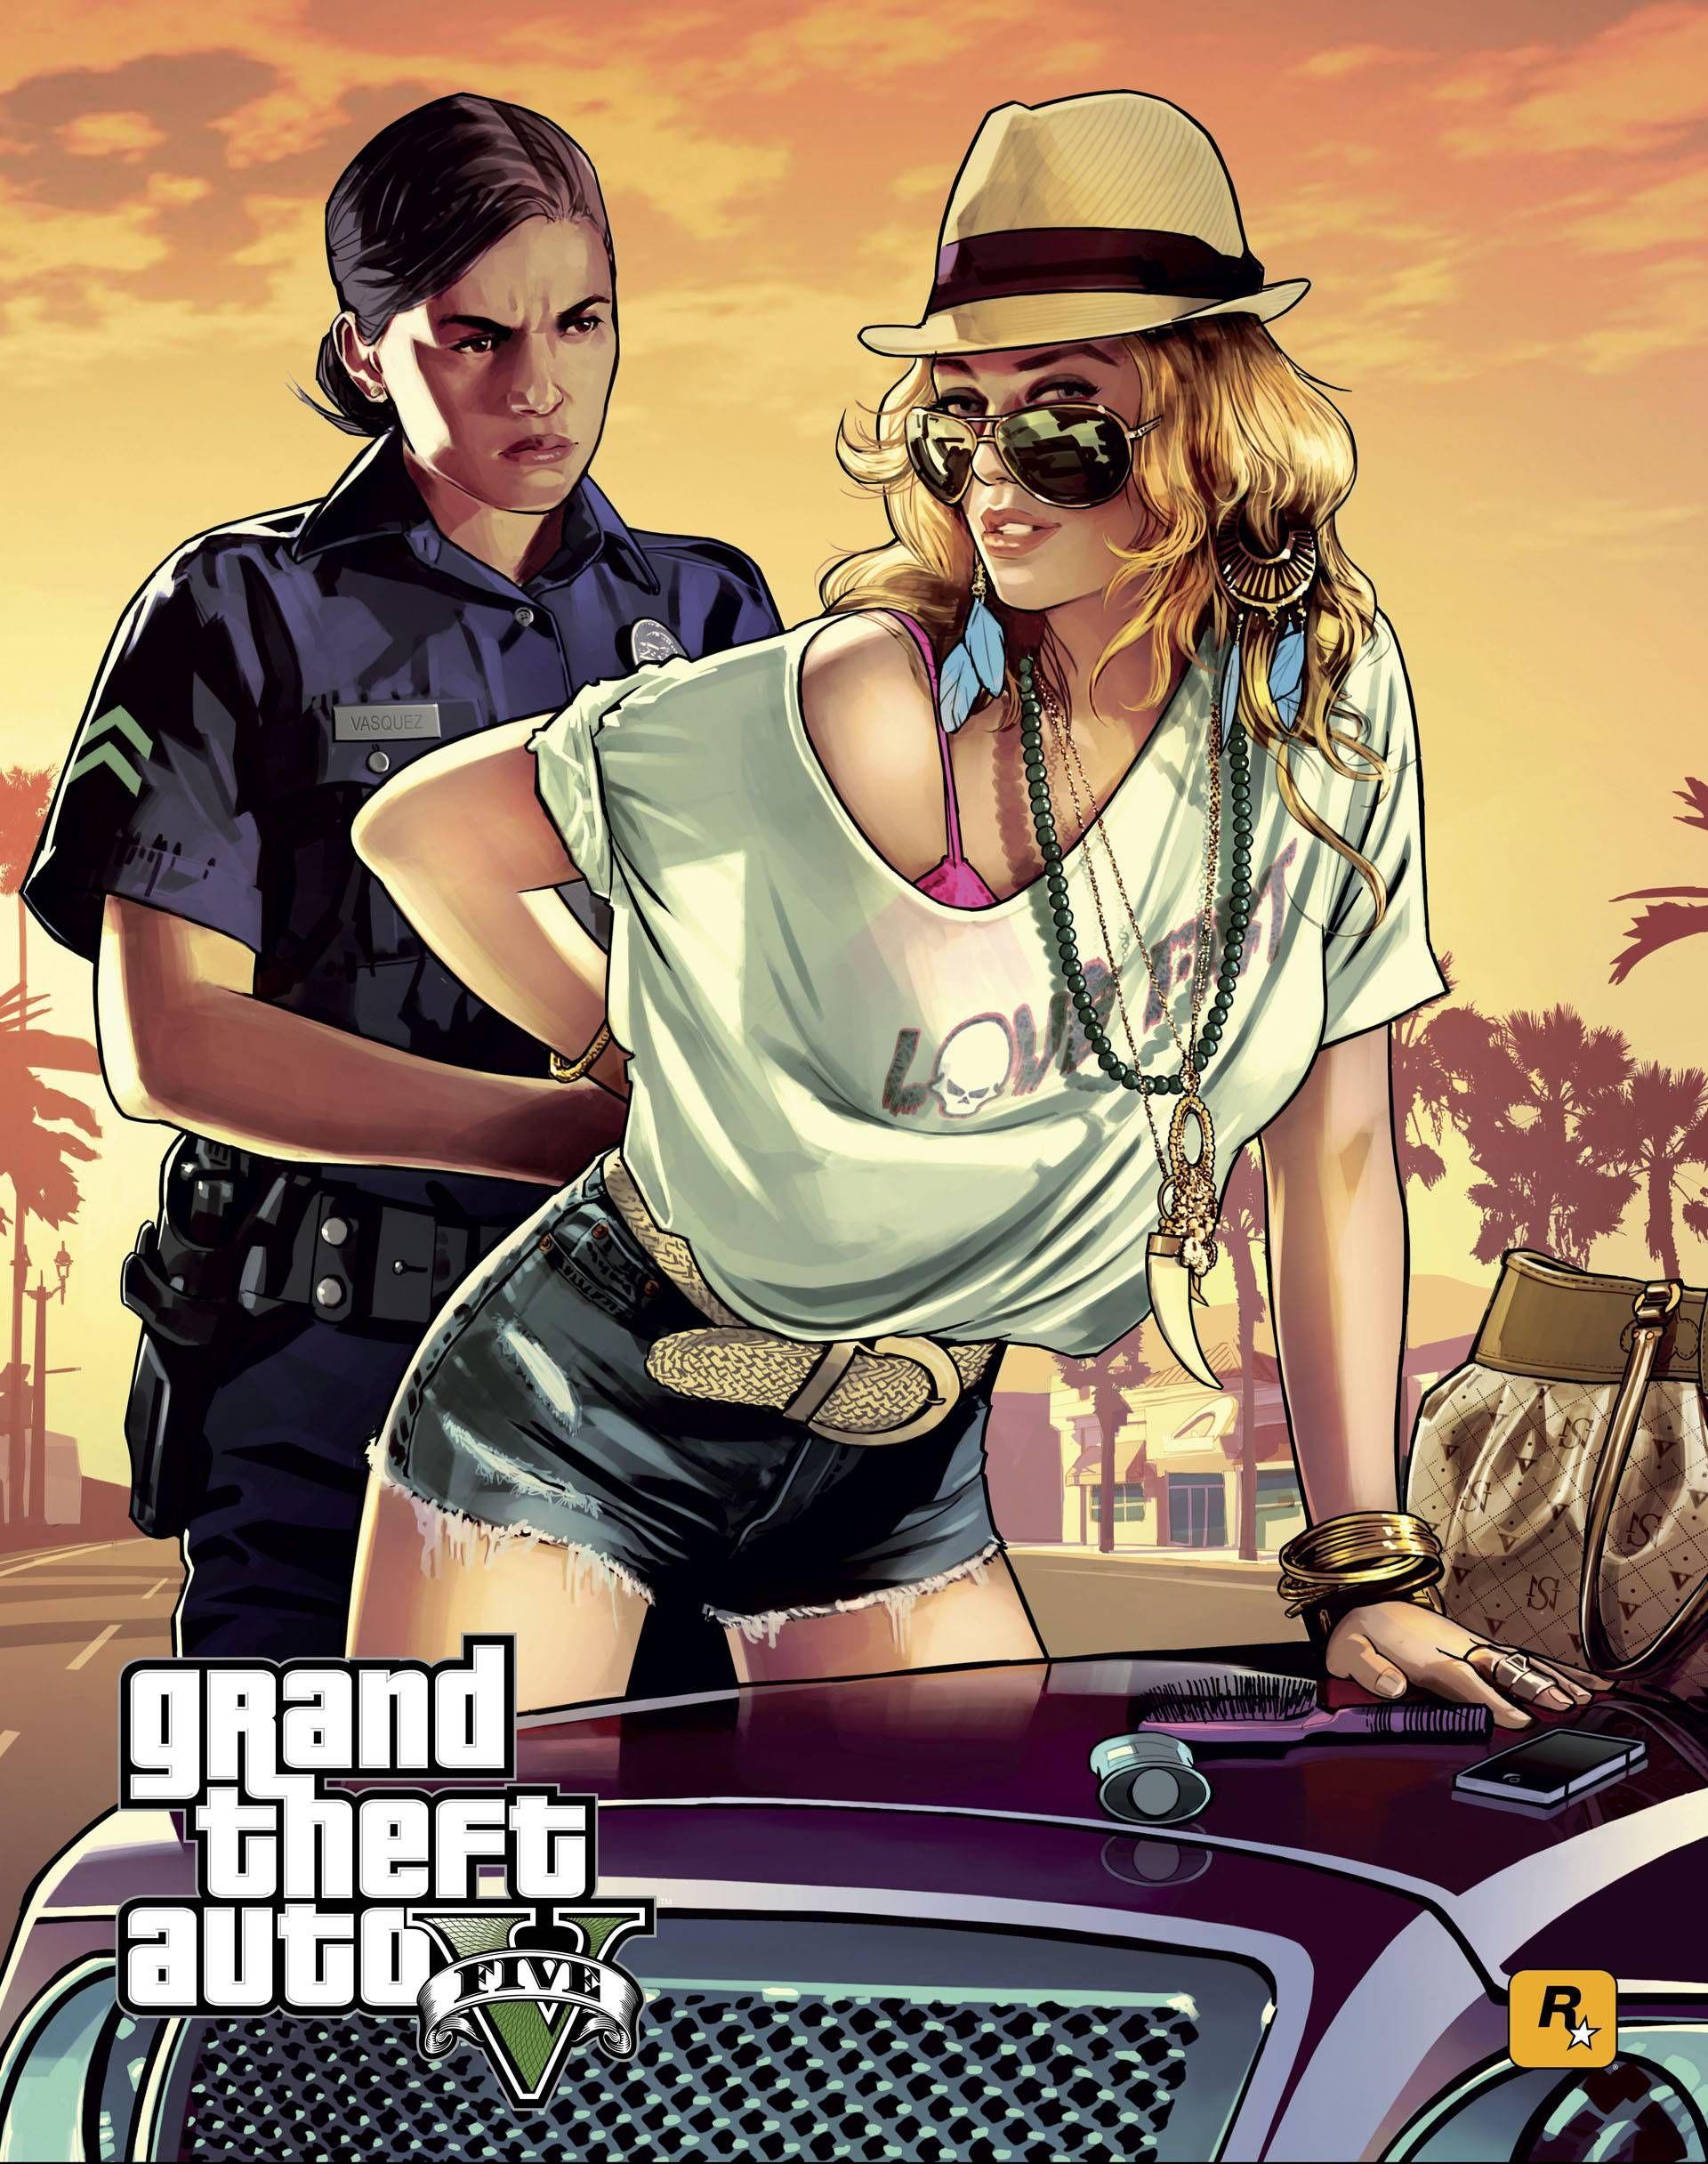 gta 5 release date delayed rockstar has delayed grand theft auto v